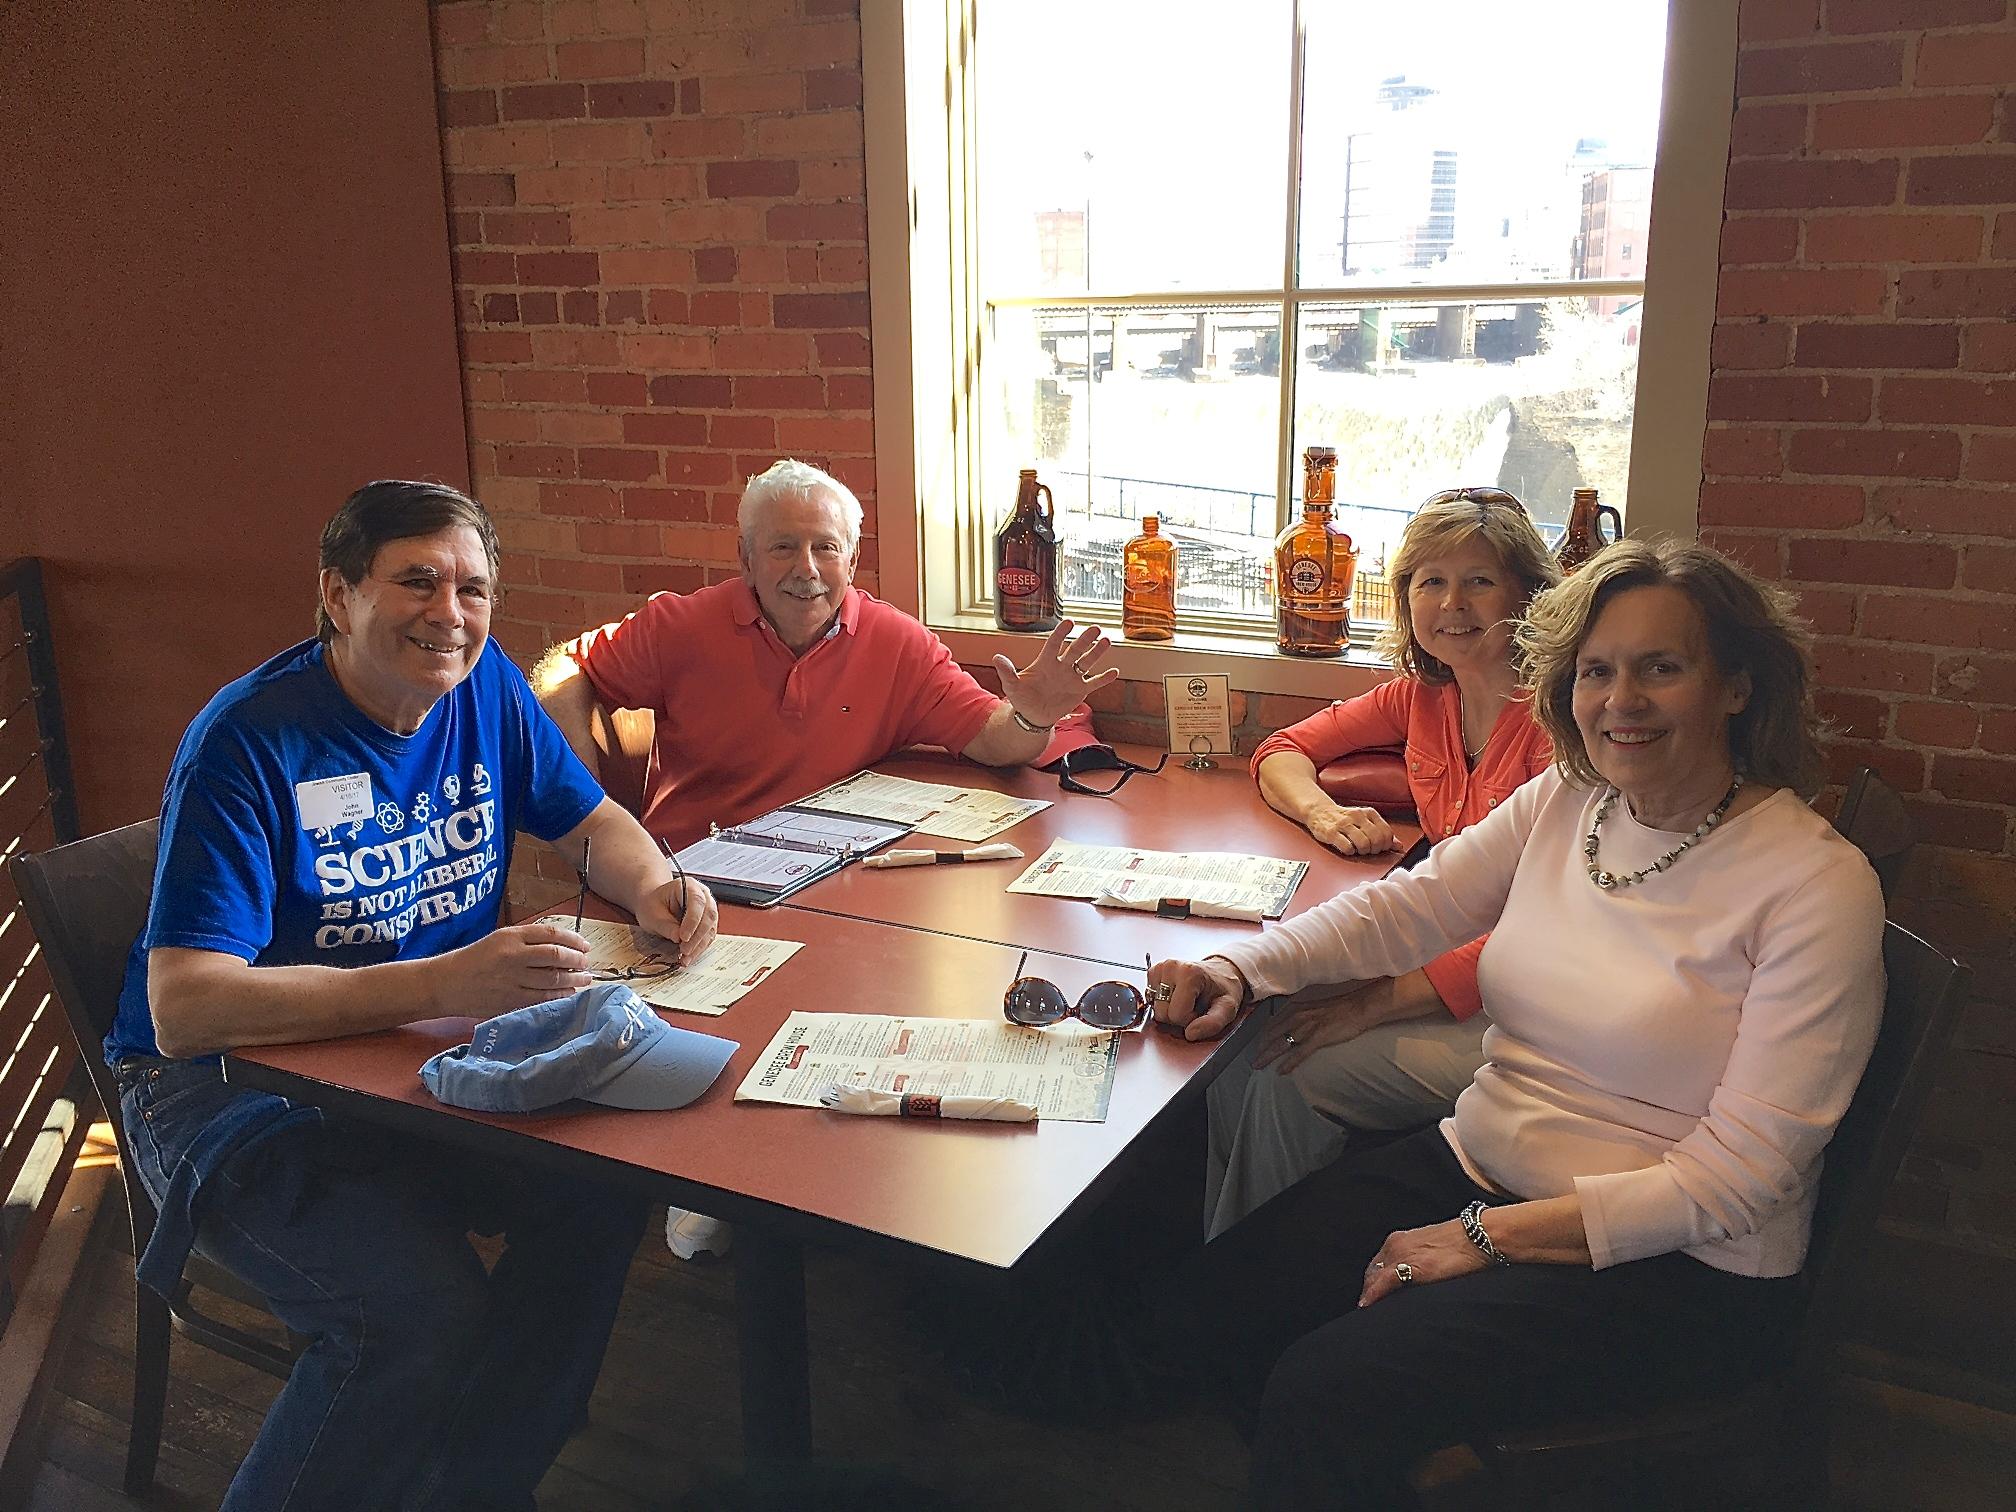 John, Don, Barbara, & Lorraine Gudas  April 16, 2017 Rochester, NY